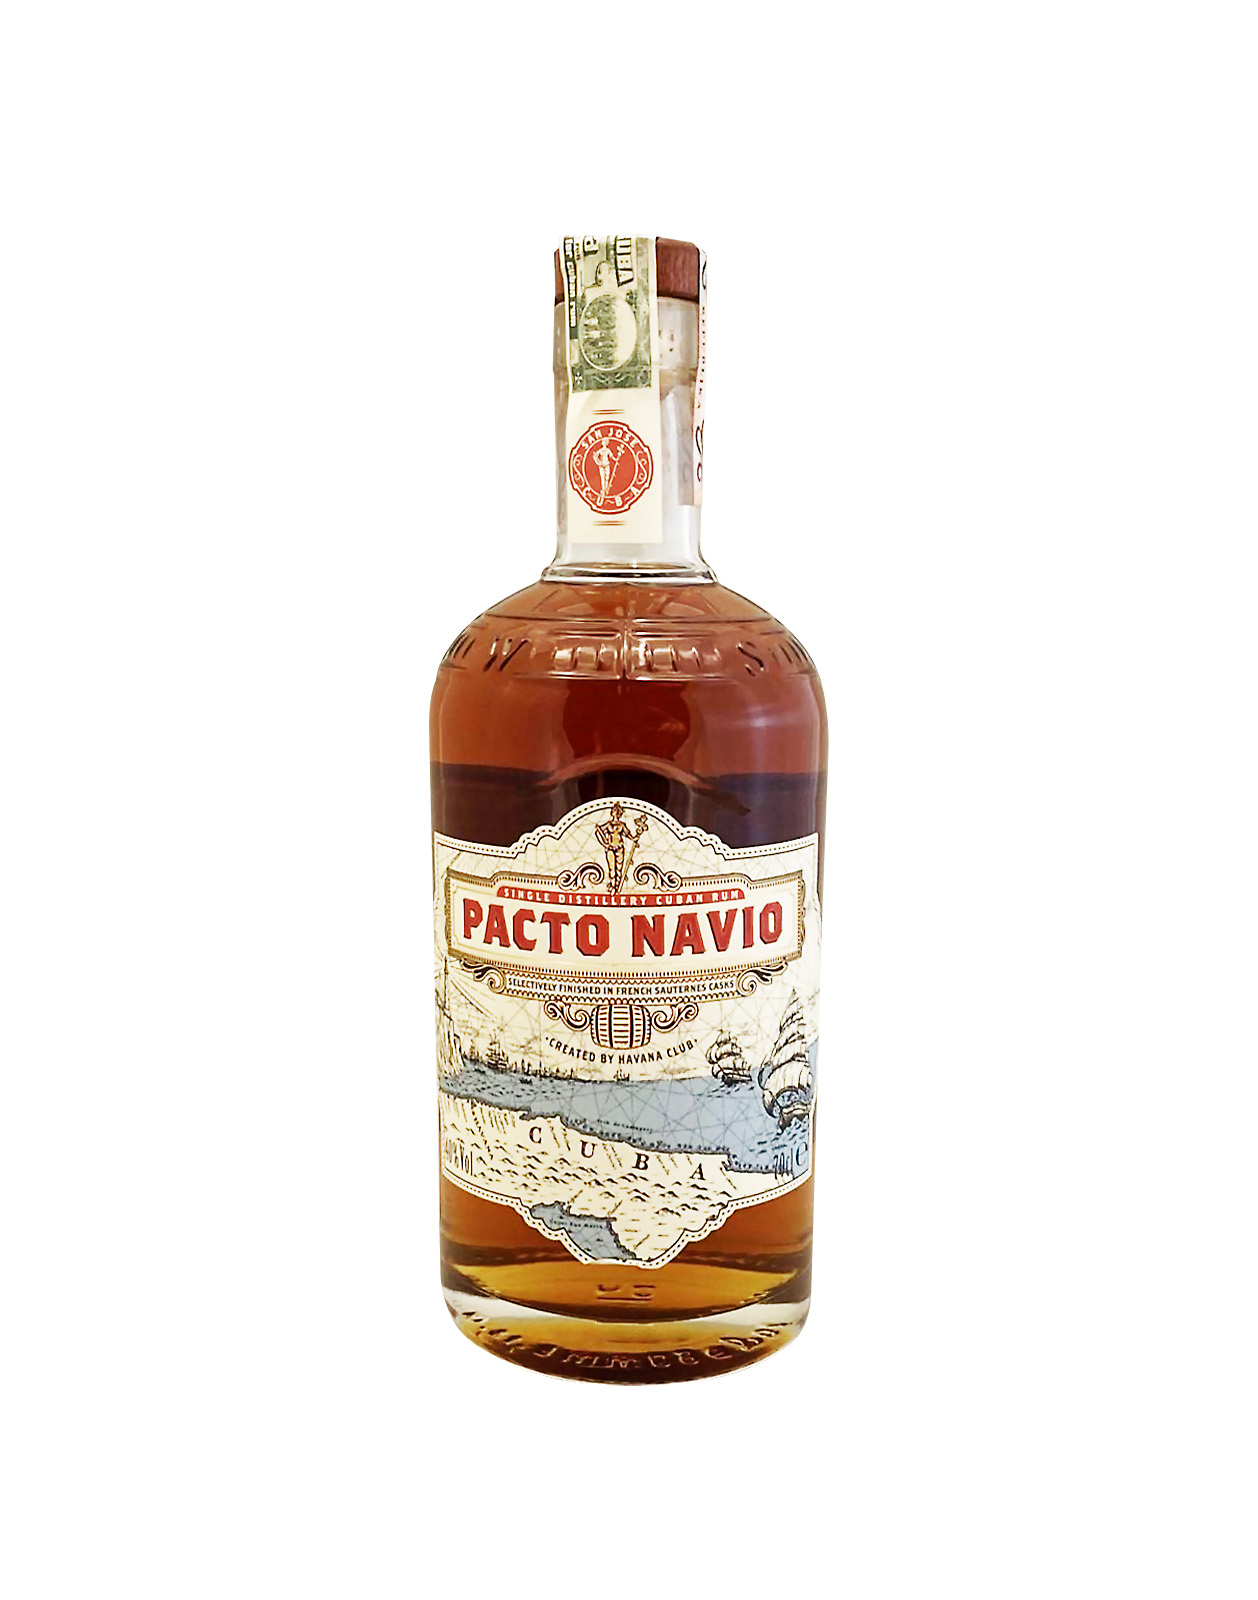 Havana CLub Pacto Navio 40%, Bottleshop Sunny wines slnecnice mesto, petrzalka, rum, rozvoz alkoholu, eshop